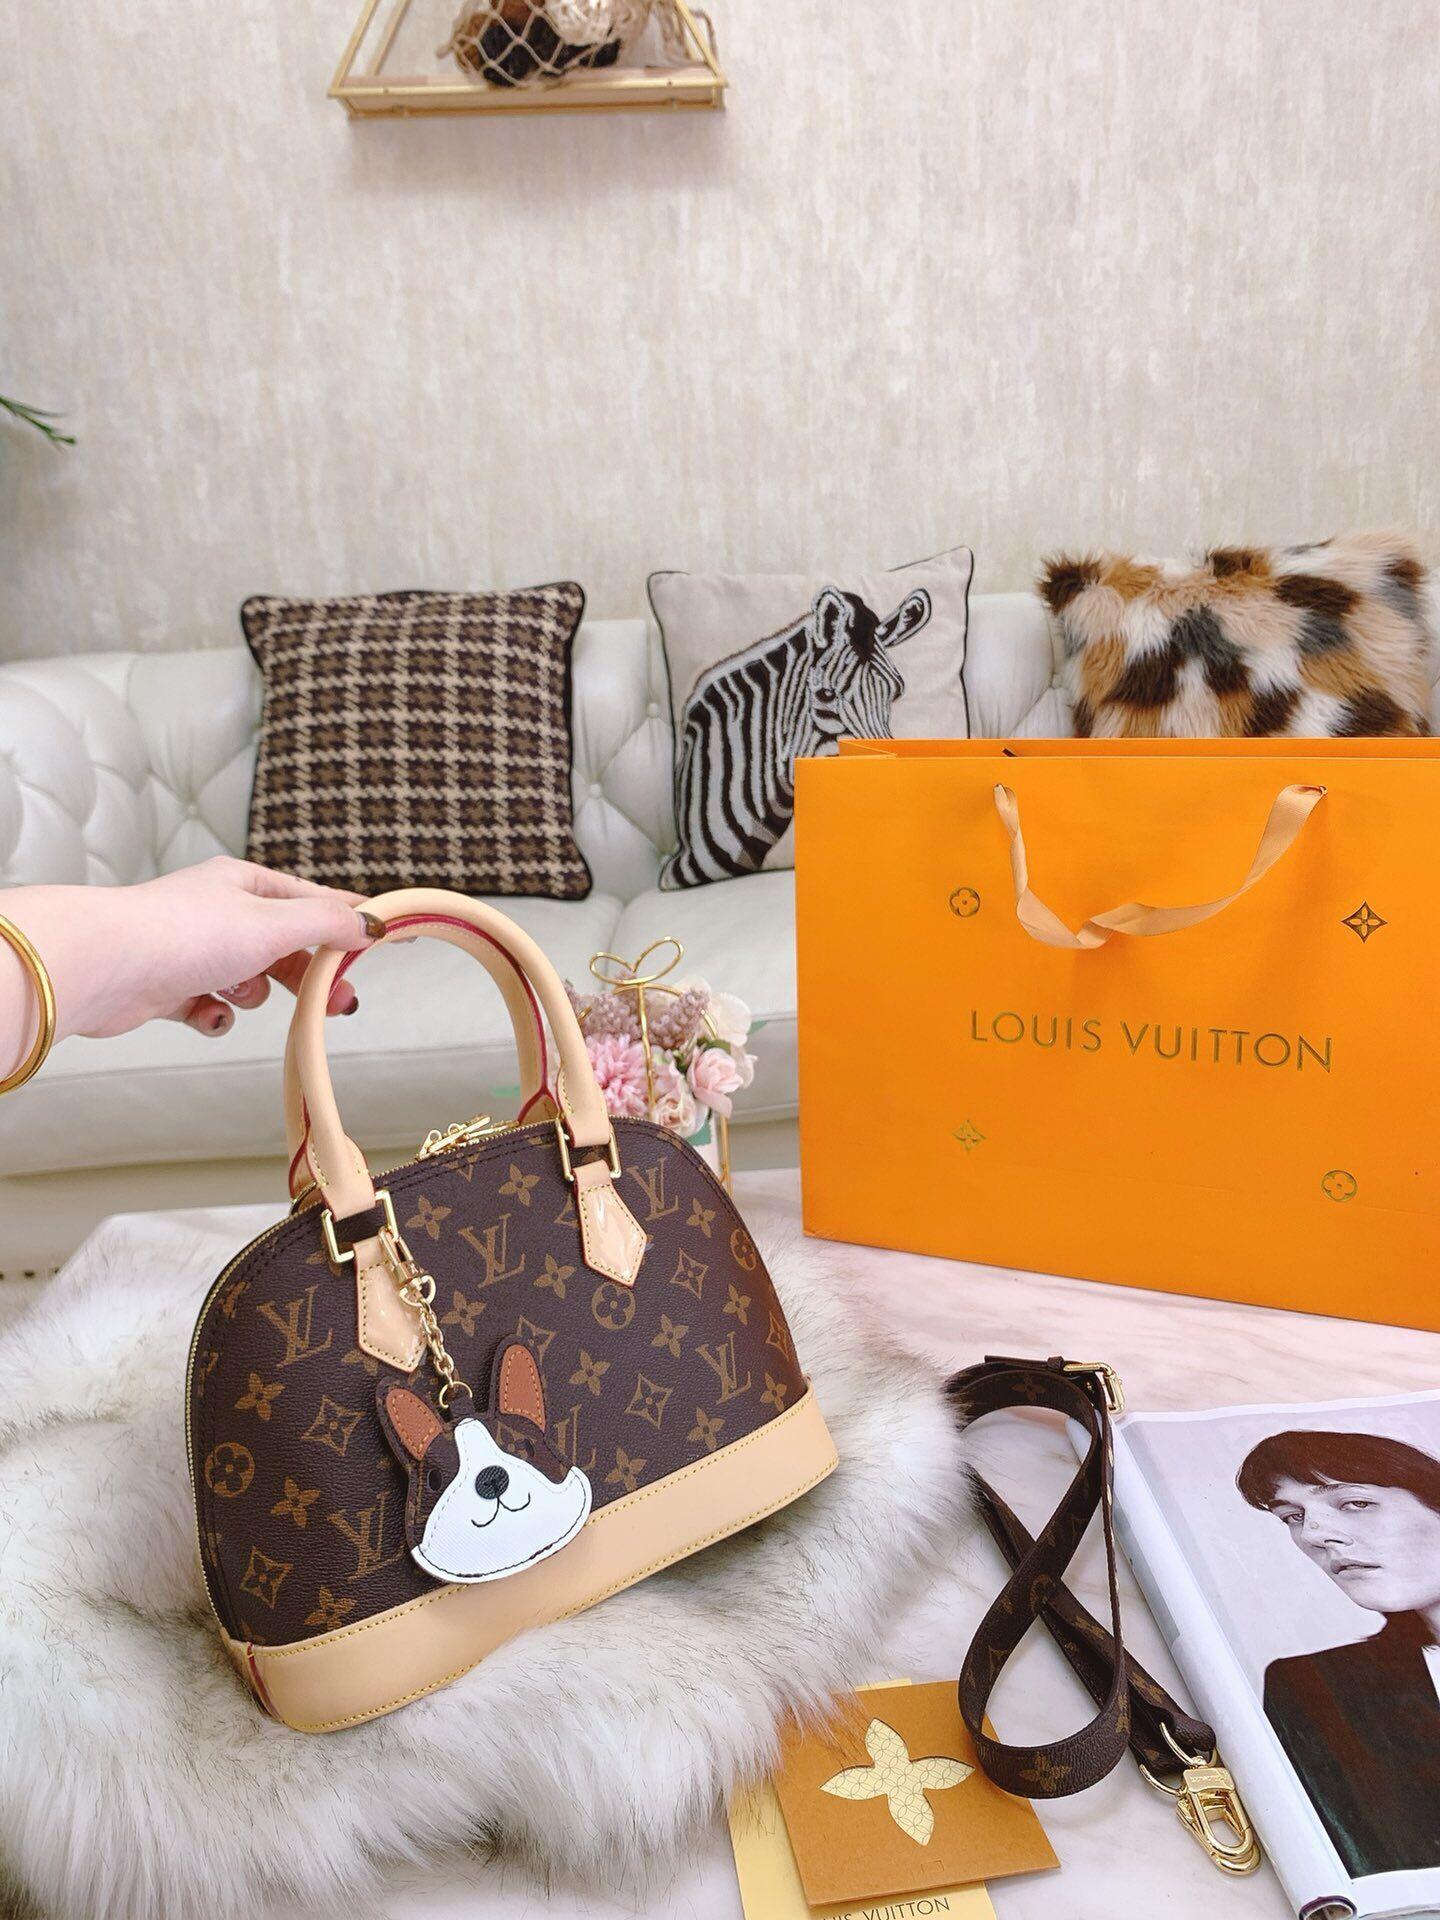 Shell womens luxury designer bag handbags 25*18cm shell bag with box letter designer crossbody bags stamped clutch designer hand bags